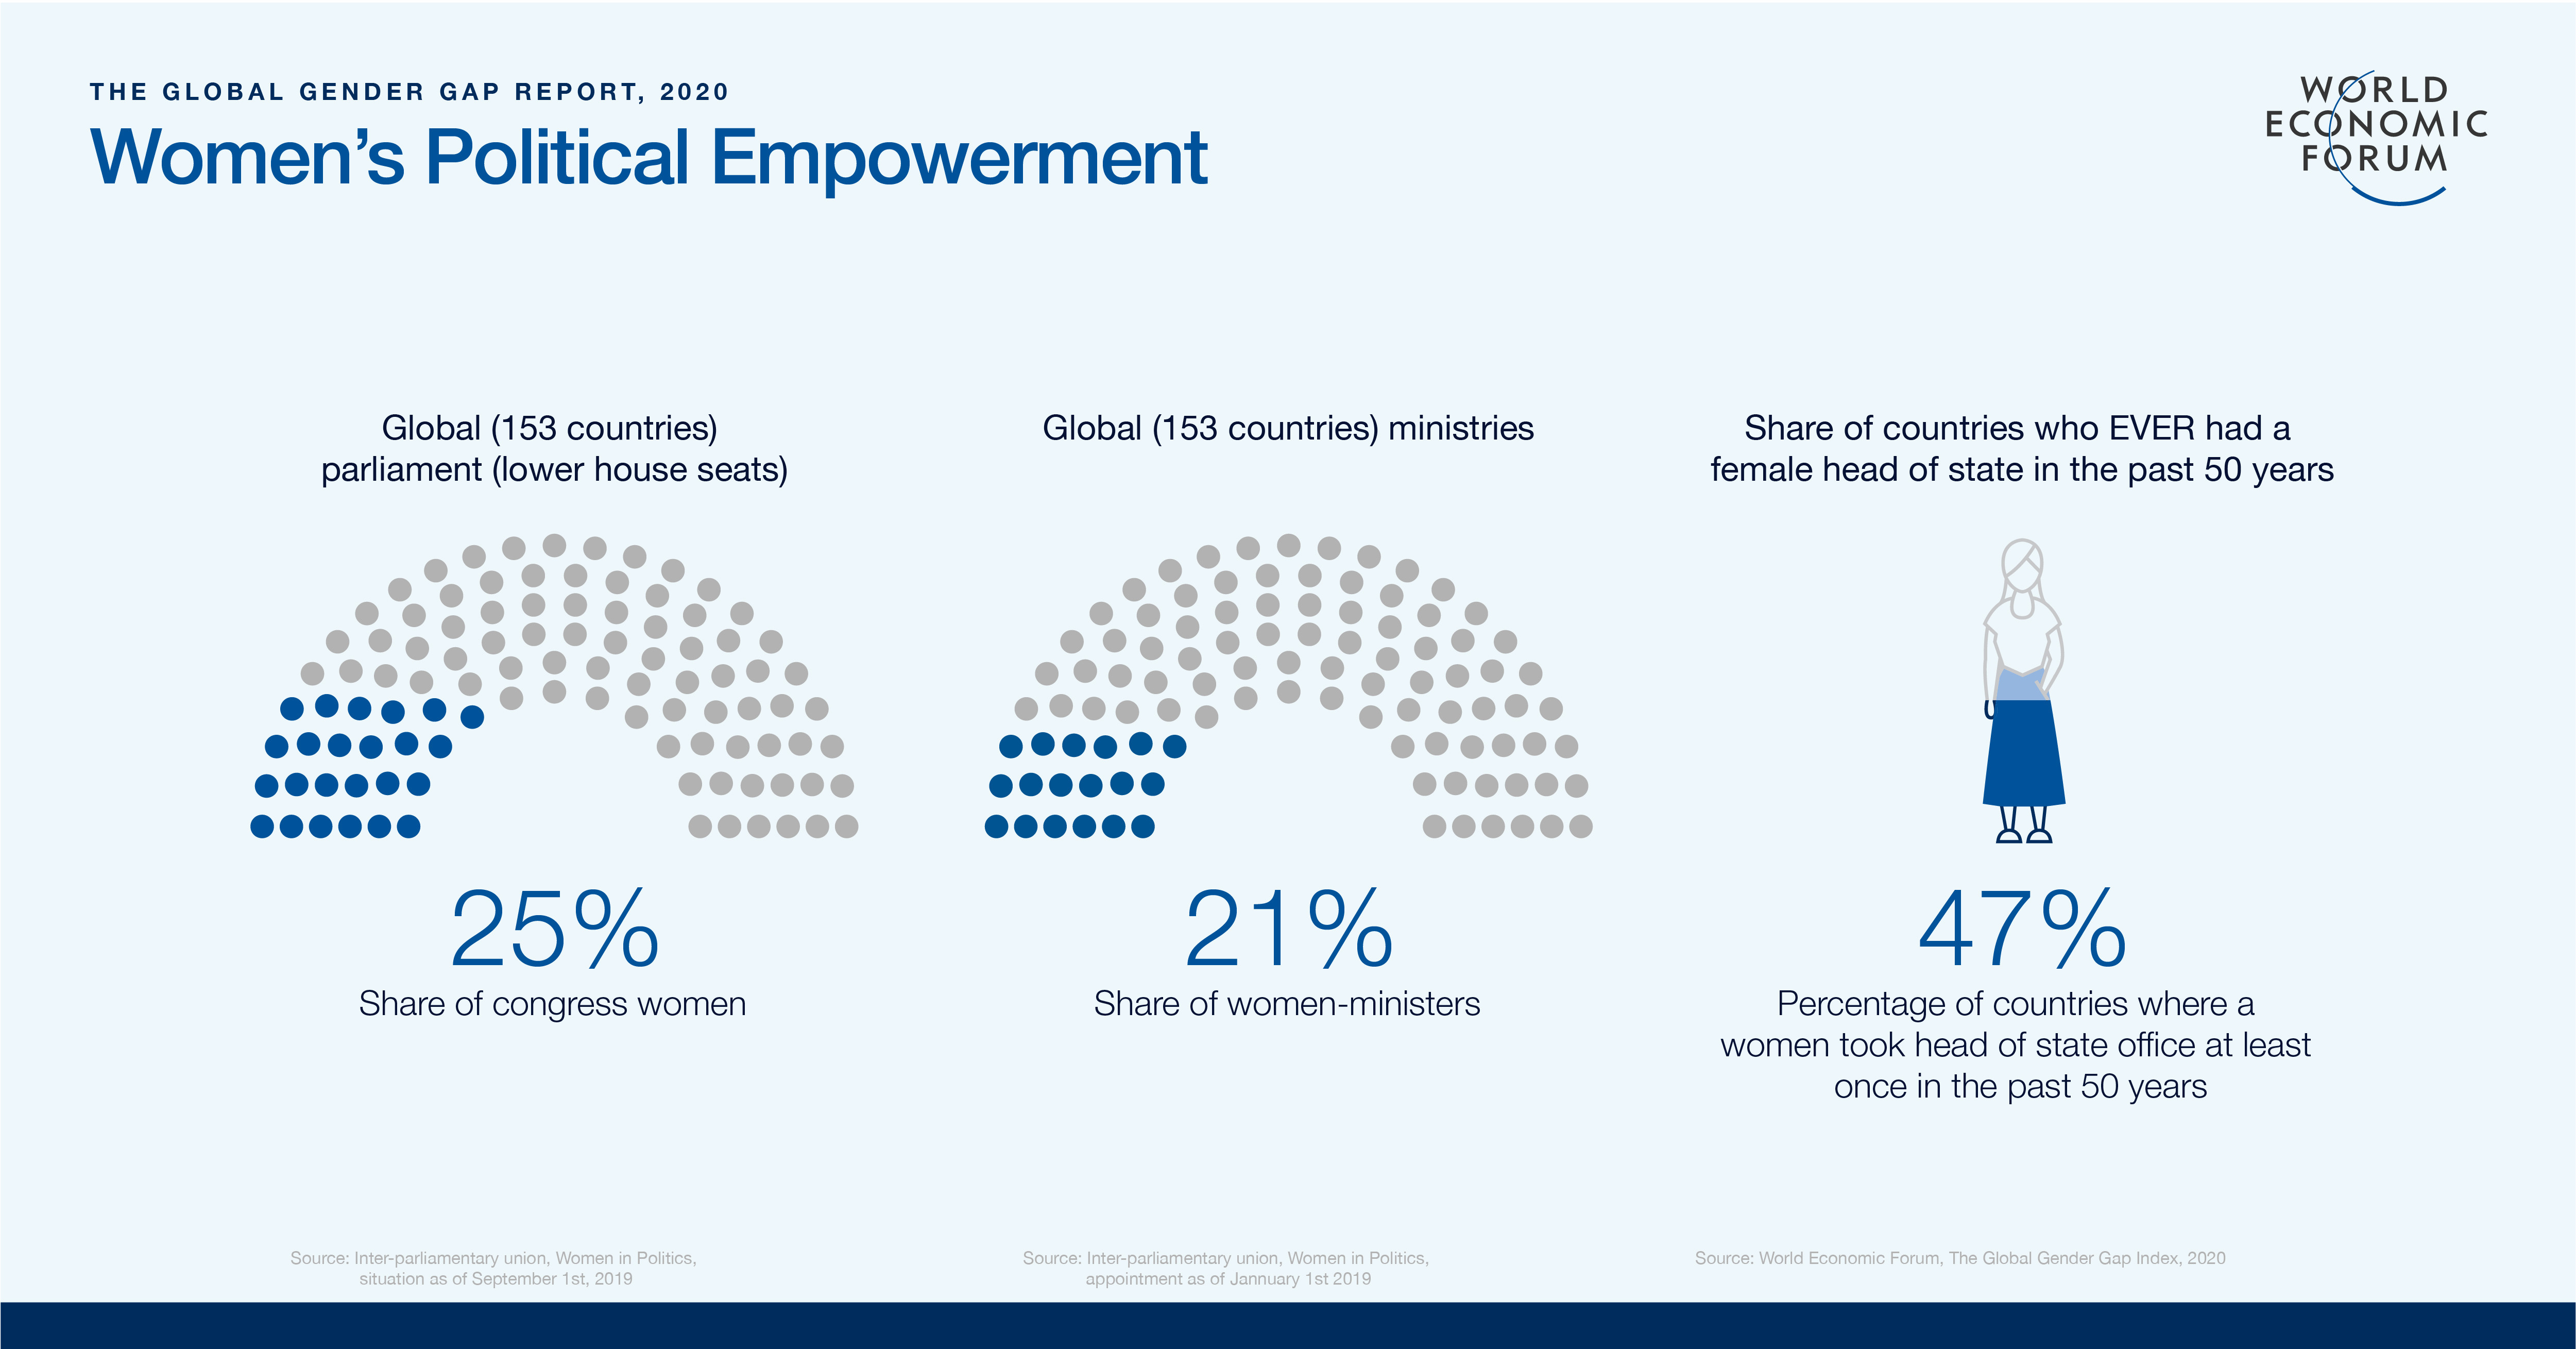 women's political empowerment - Global Gender Gap Report 2020